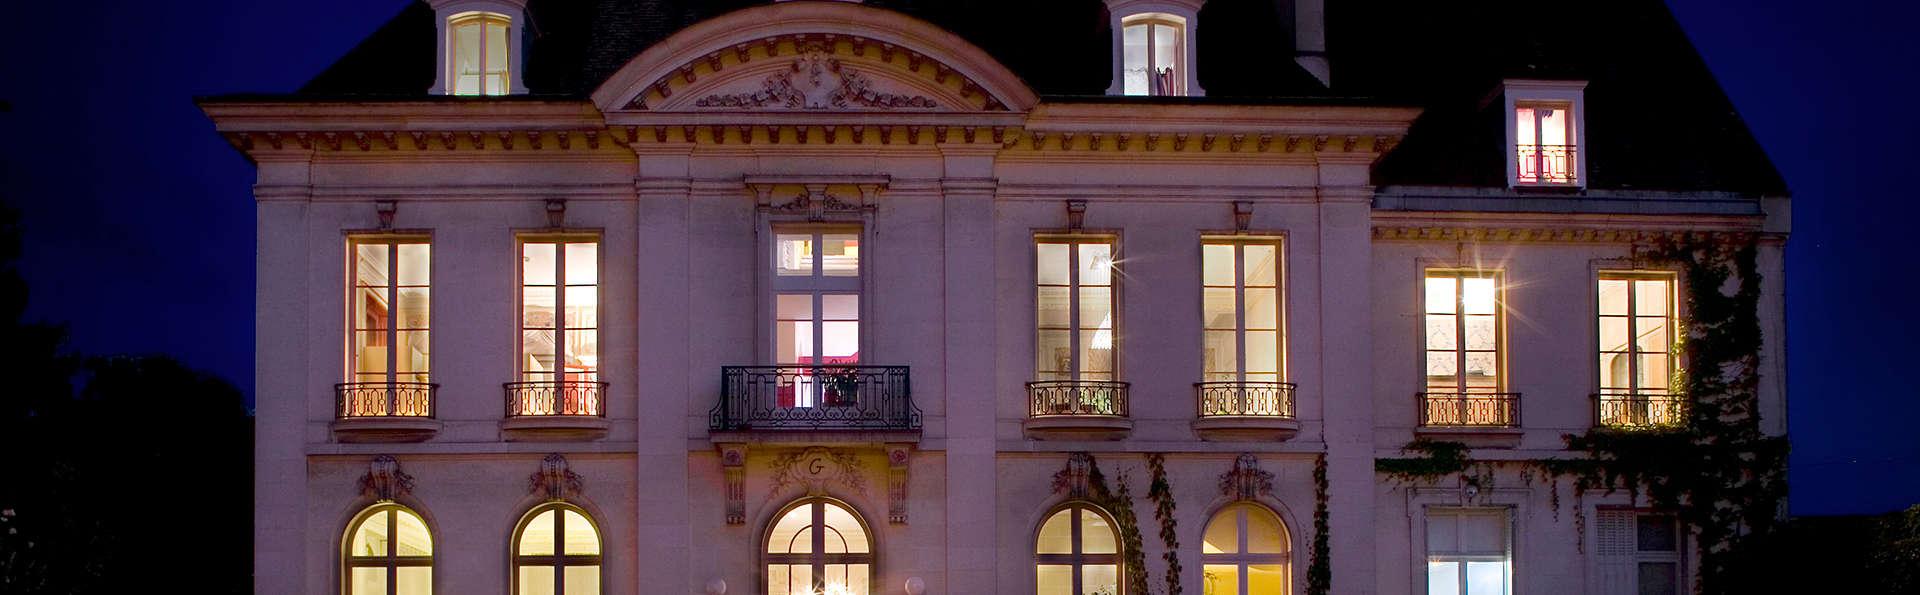 Hôtel Restaurant La Gourmandine - edit_front2.jpg